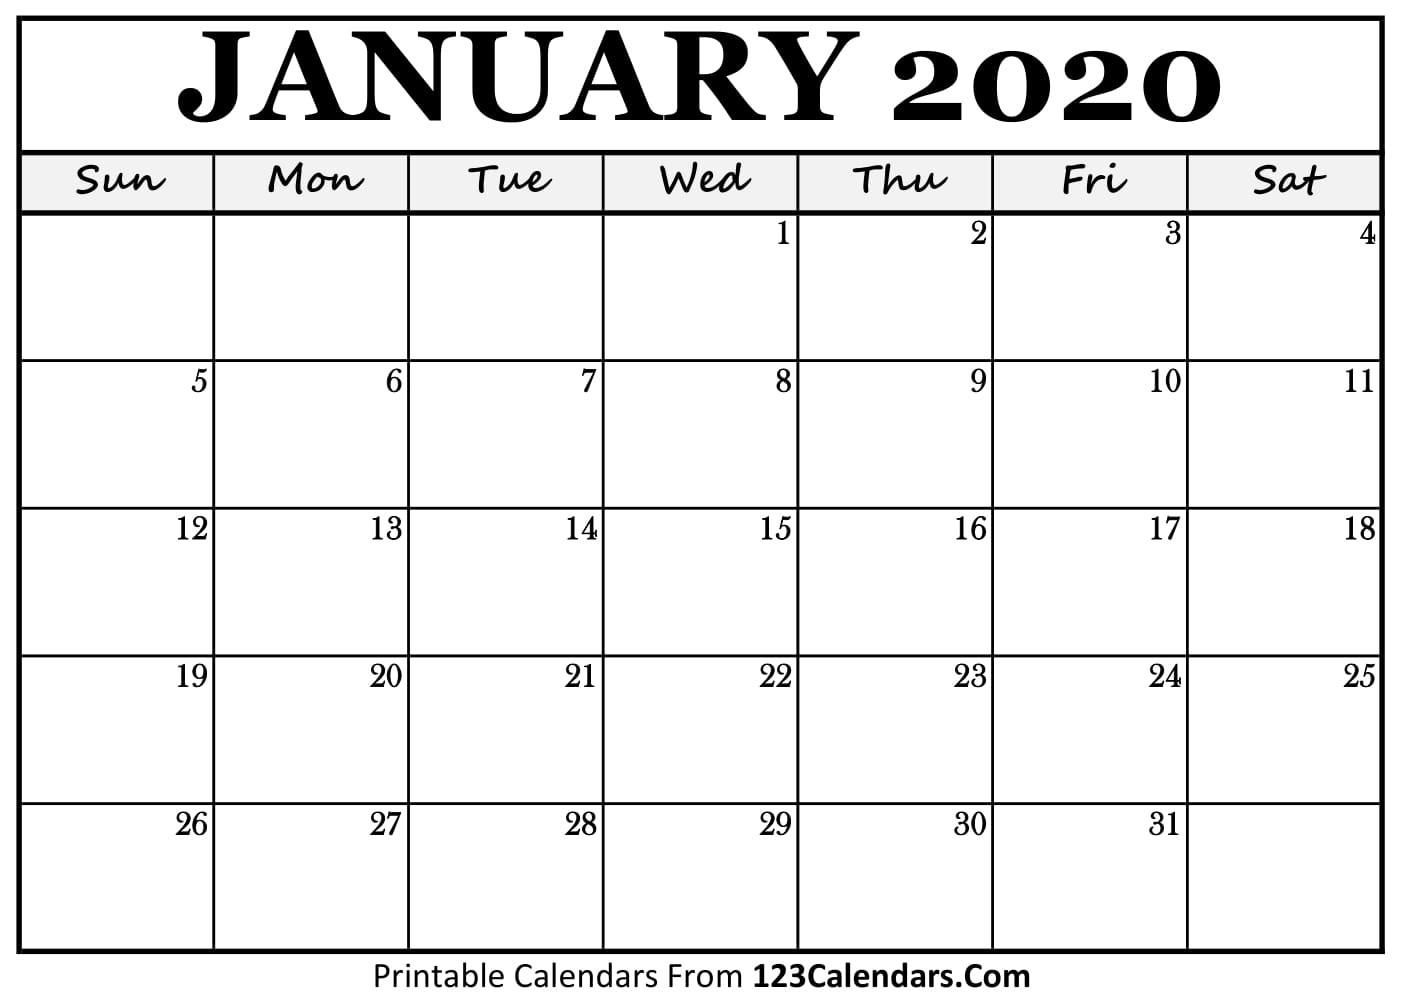 Free Printable Calendar | 123Calendars  Calendar Templates 2020 Printable